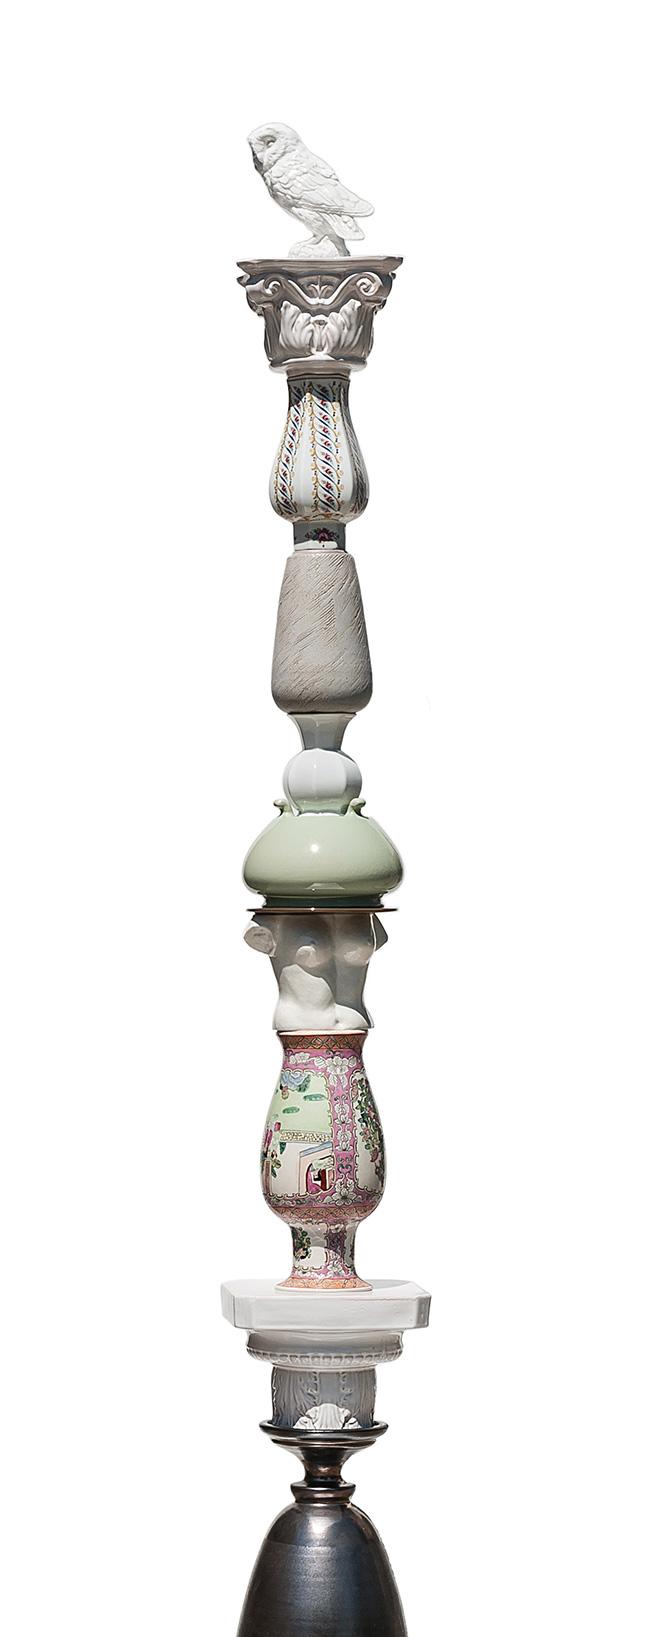 Luca Freschi - Cariatide 03 (Civetta), 2019, terracotta ceramica e legno, cm 44x44x390, particolare #1